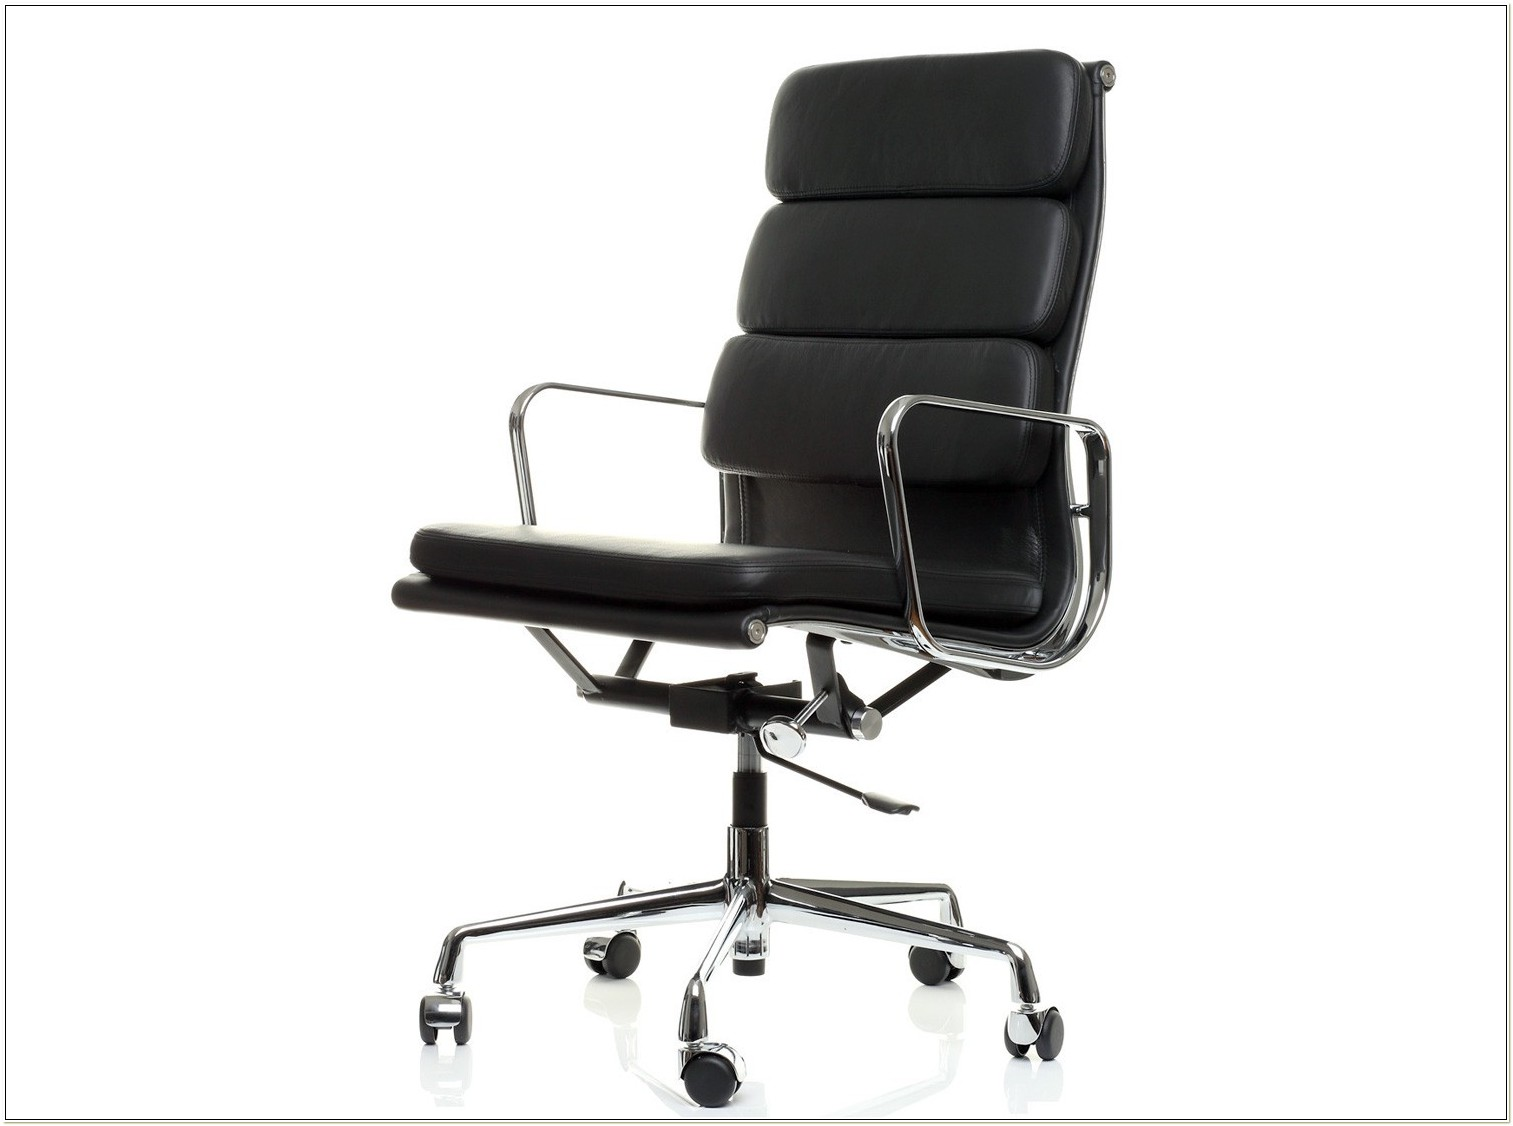 Eames Soft Pad Lounge Chair Replica